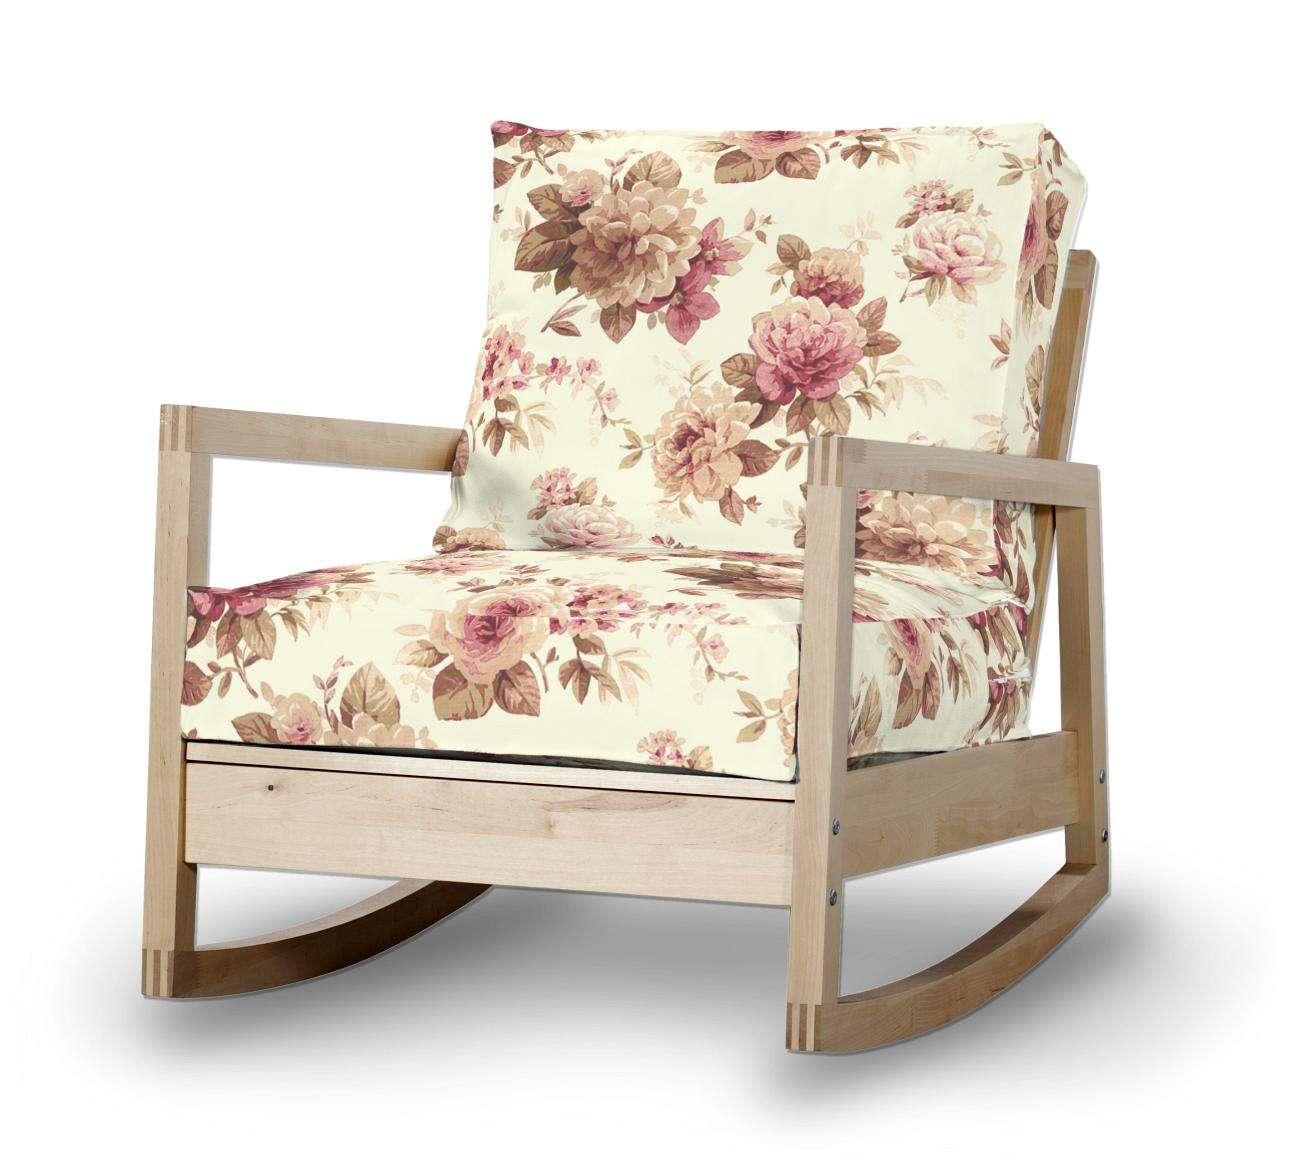 Lillberg Sesselbezug Sesselhusse, Modell Lillberg von der Kollektion Mirella, Stoff: 141-06